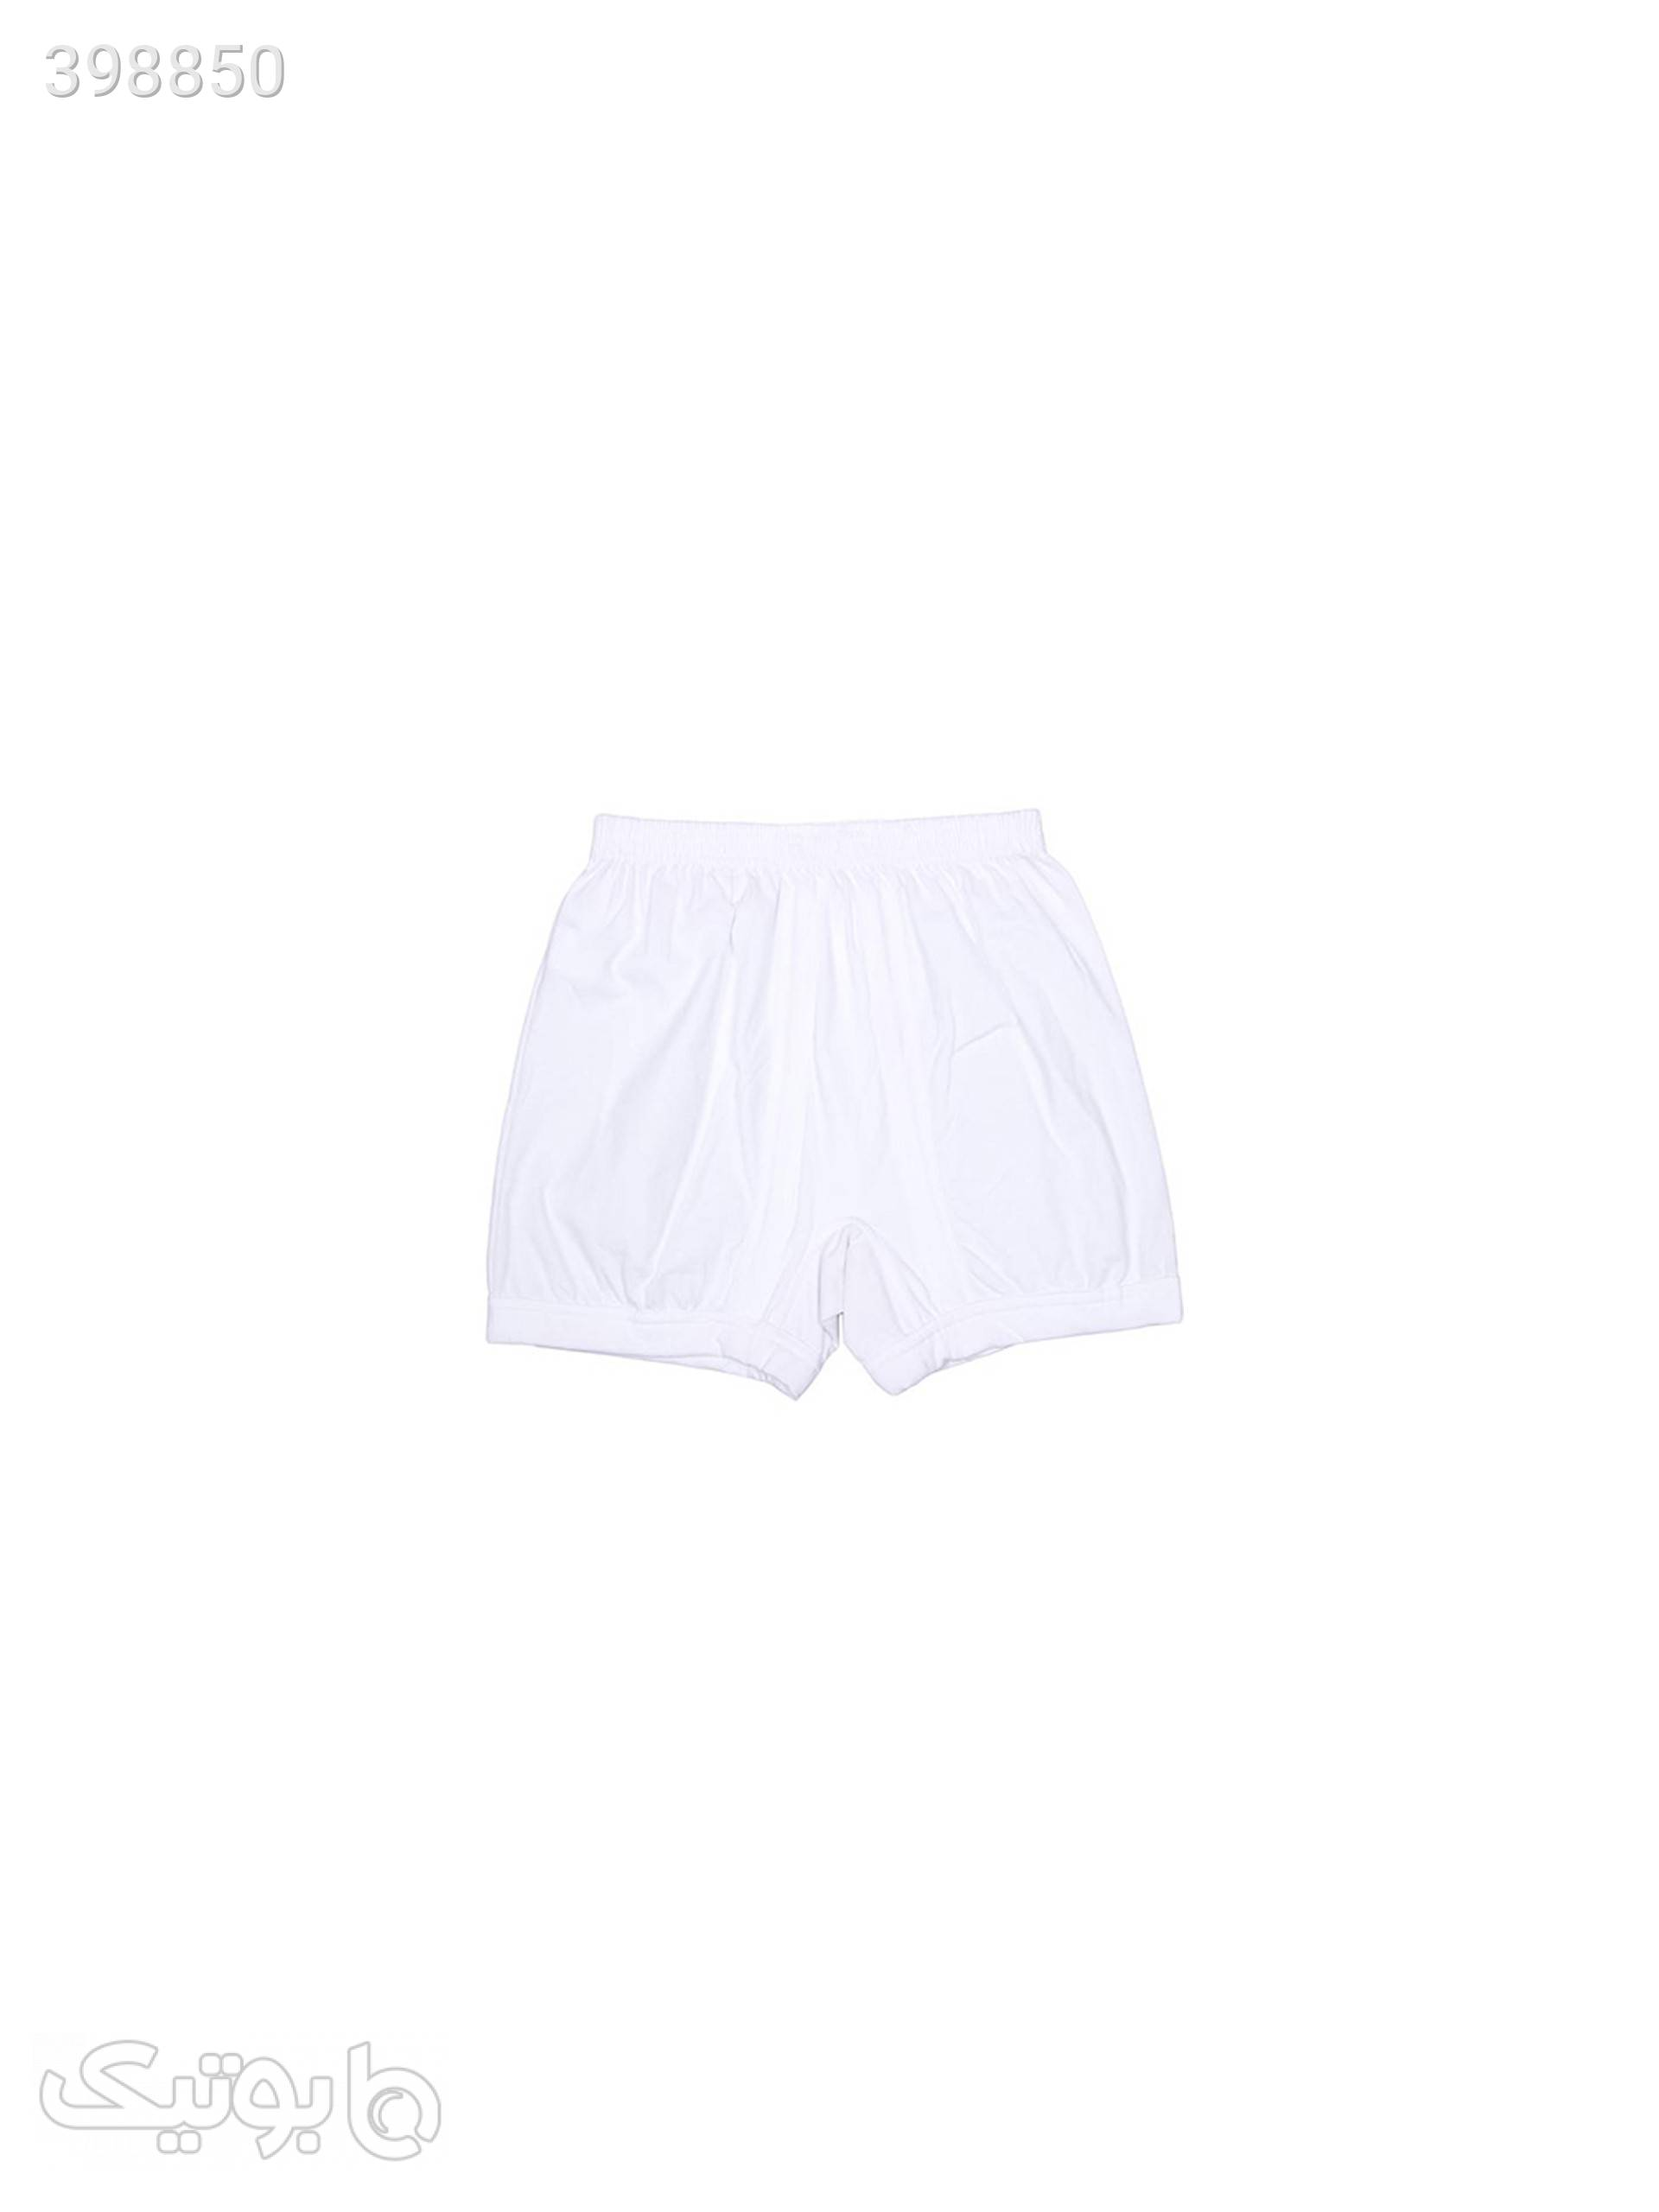 شورت مردانه مدل 15 سفید لباس زیر مردانه